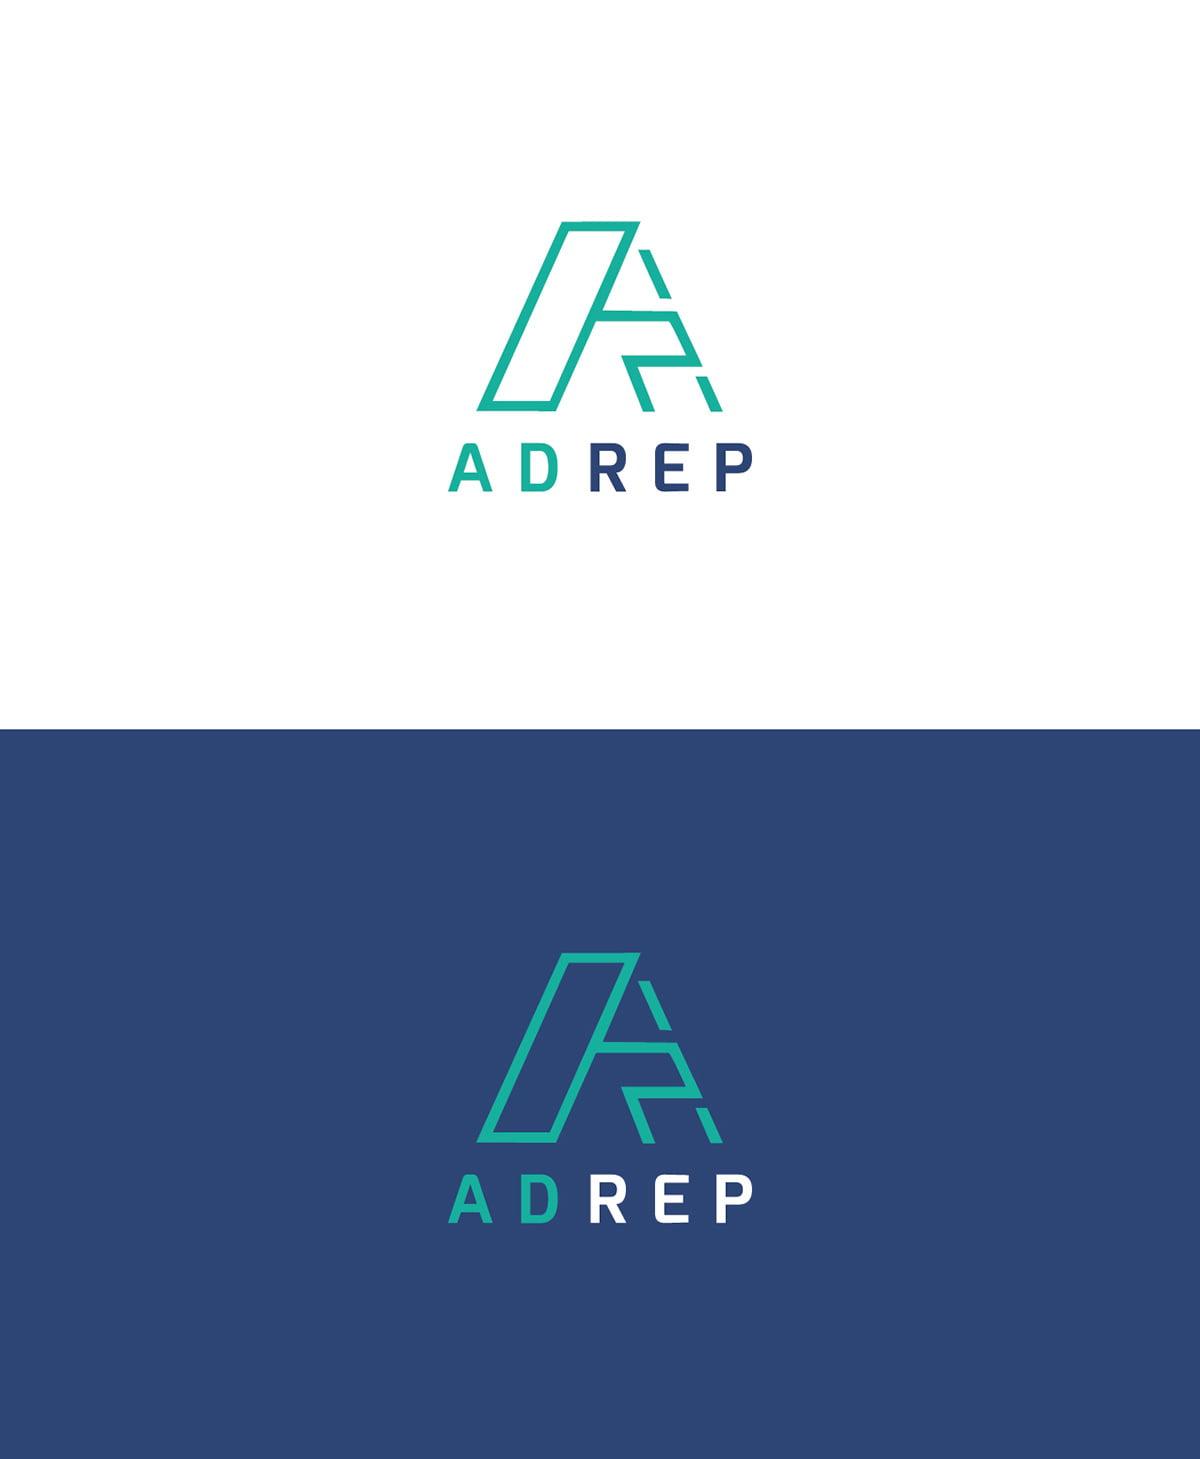 AdRep_logo__1